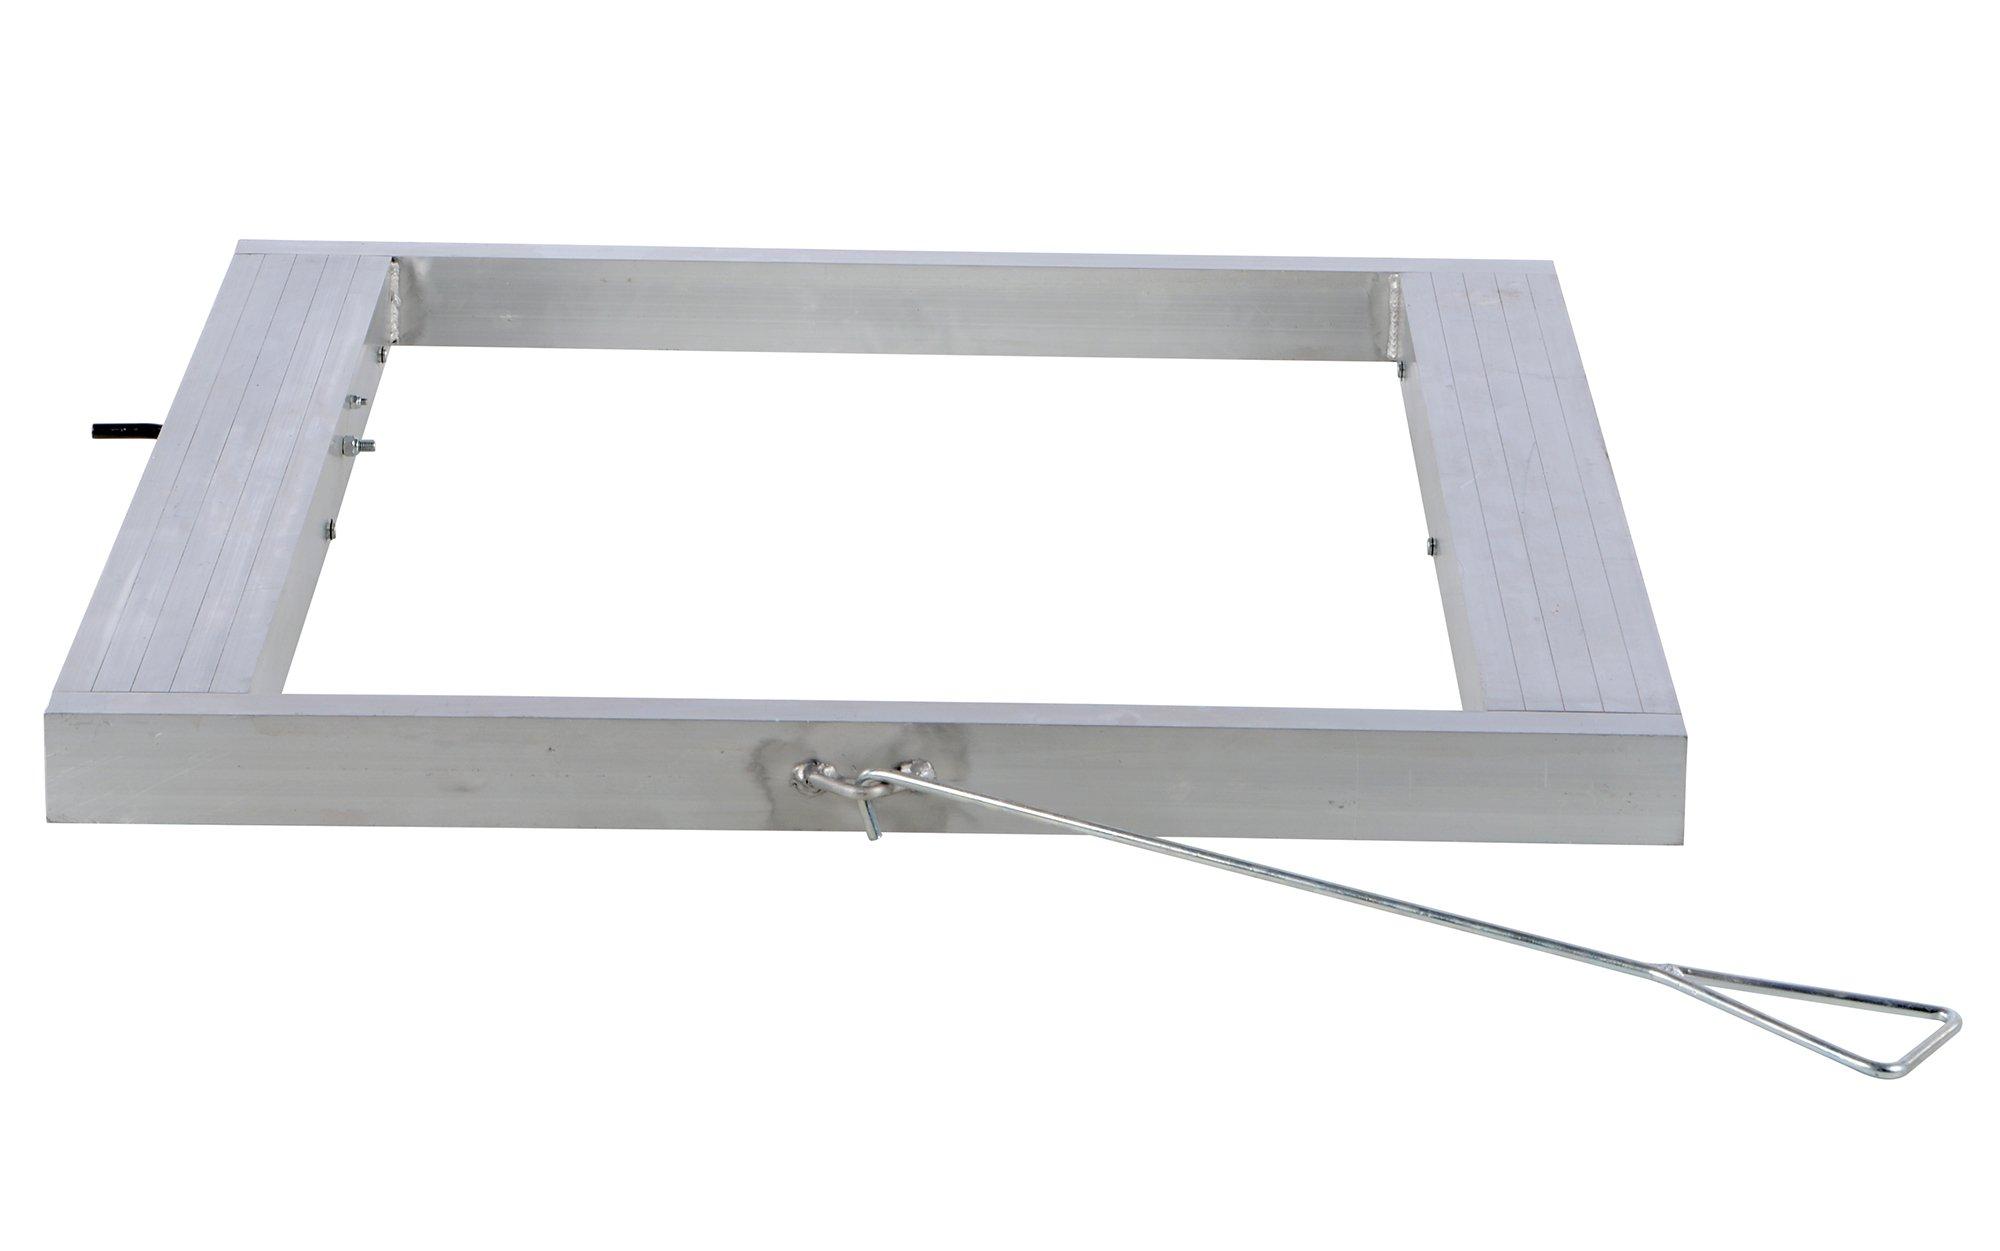 Vestil DOL-4248-6T Pallet Dolly, Tilting, Aluminum, 4,000 lb. Capacity, 4-1/8 x 42 x 48'' by Vestil